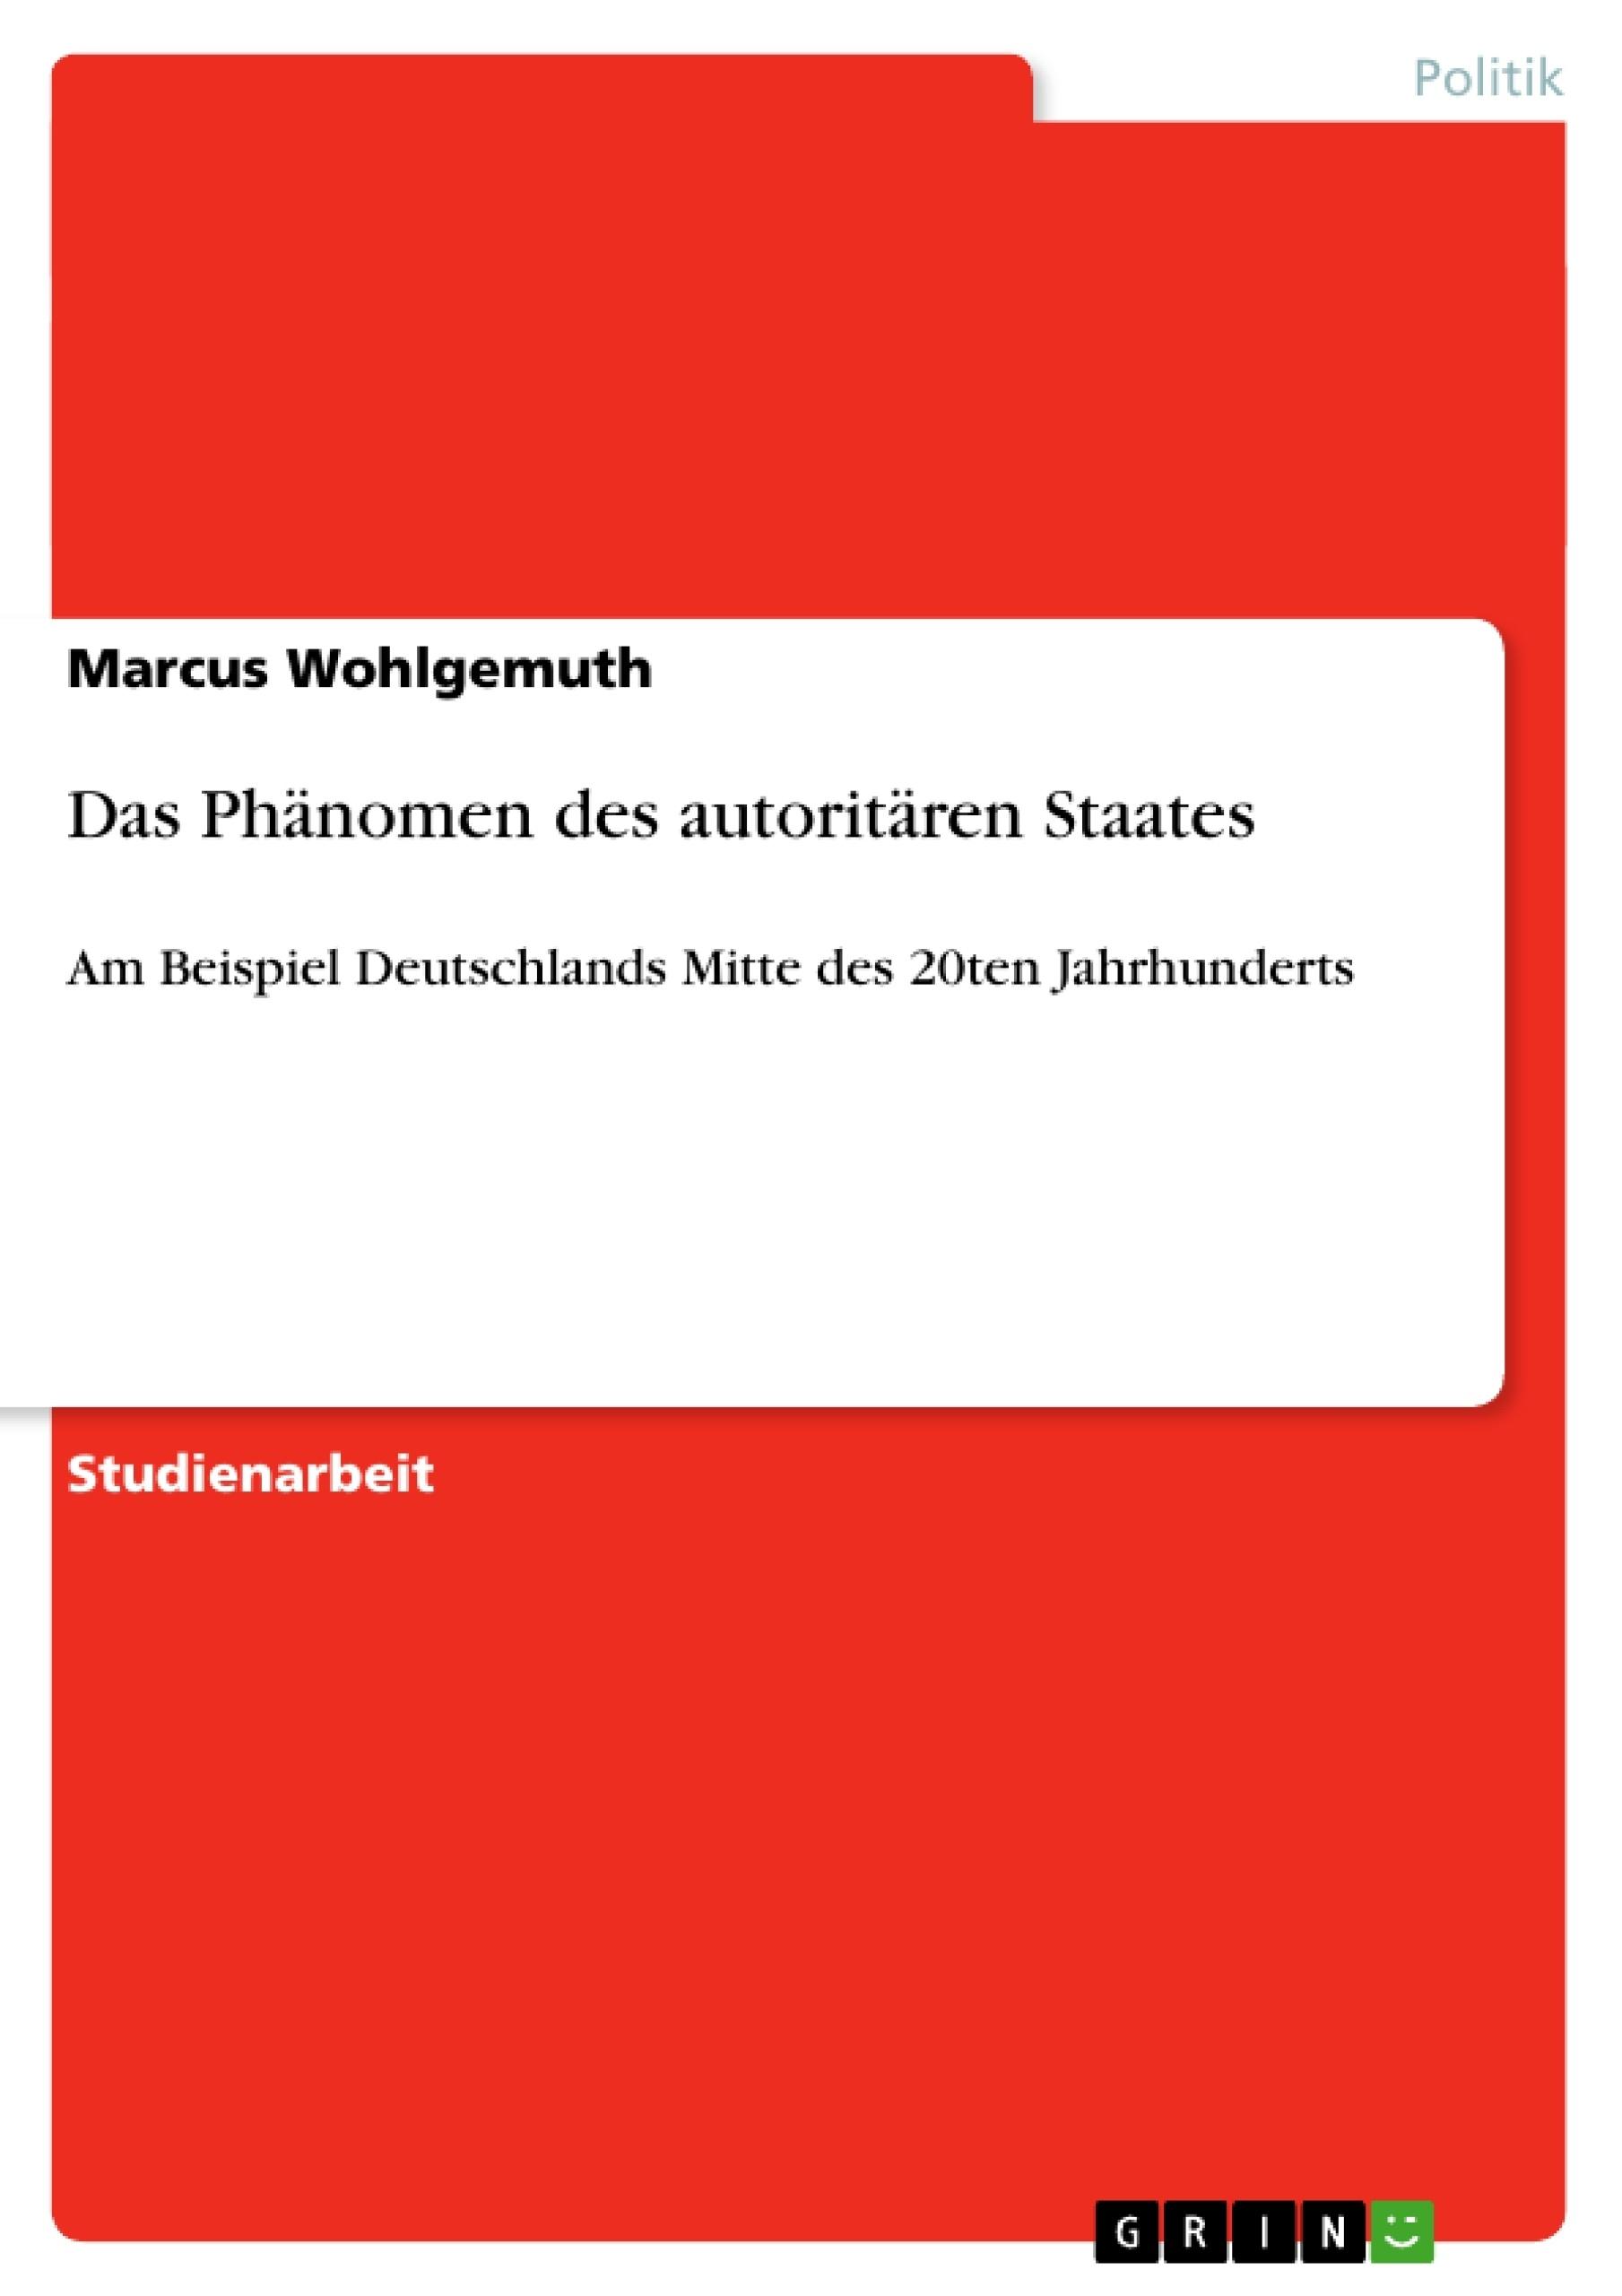 Titel: Das Phänomen des autoritären Staates